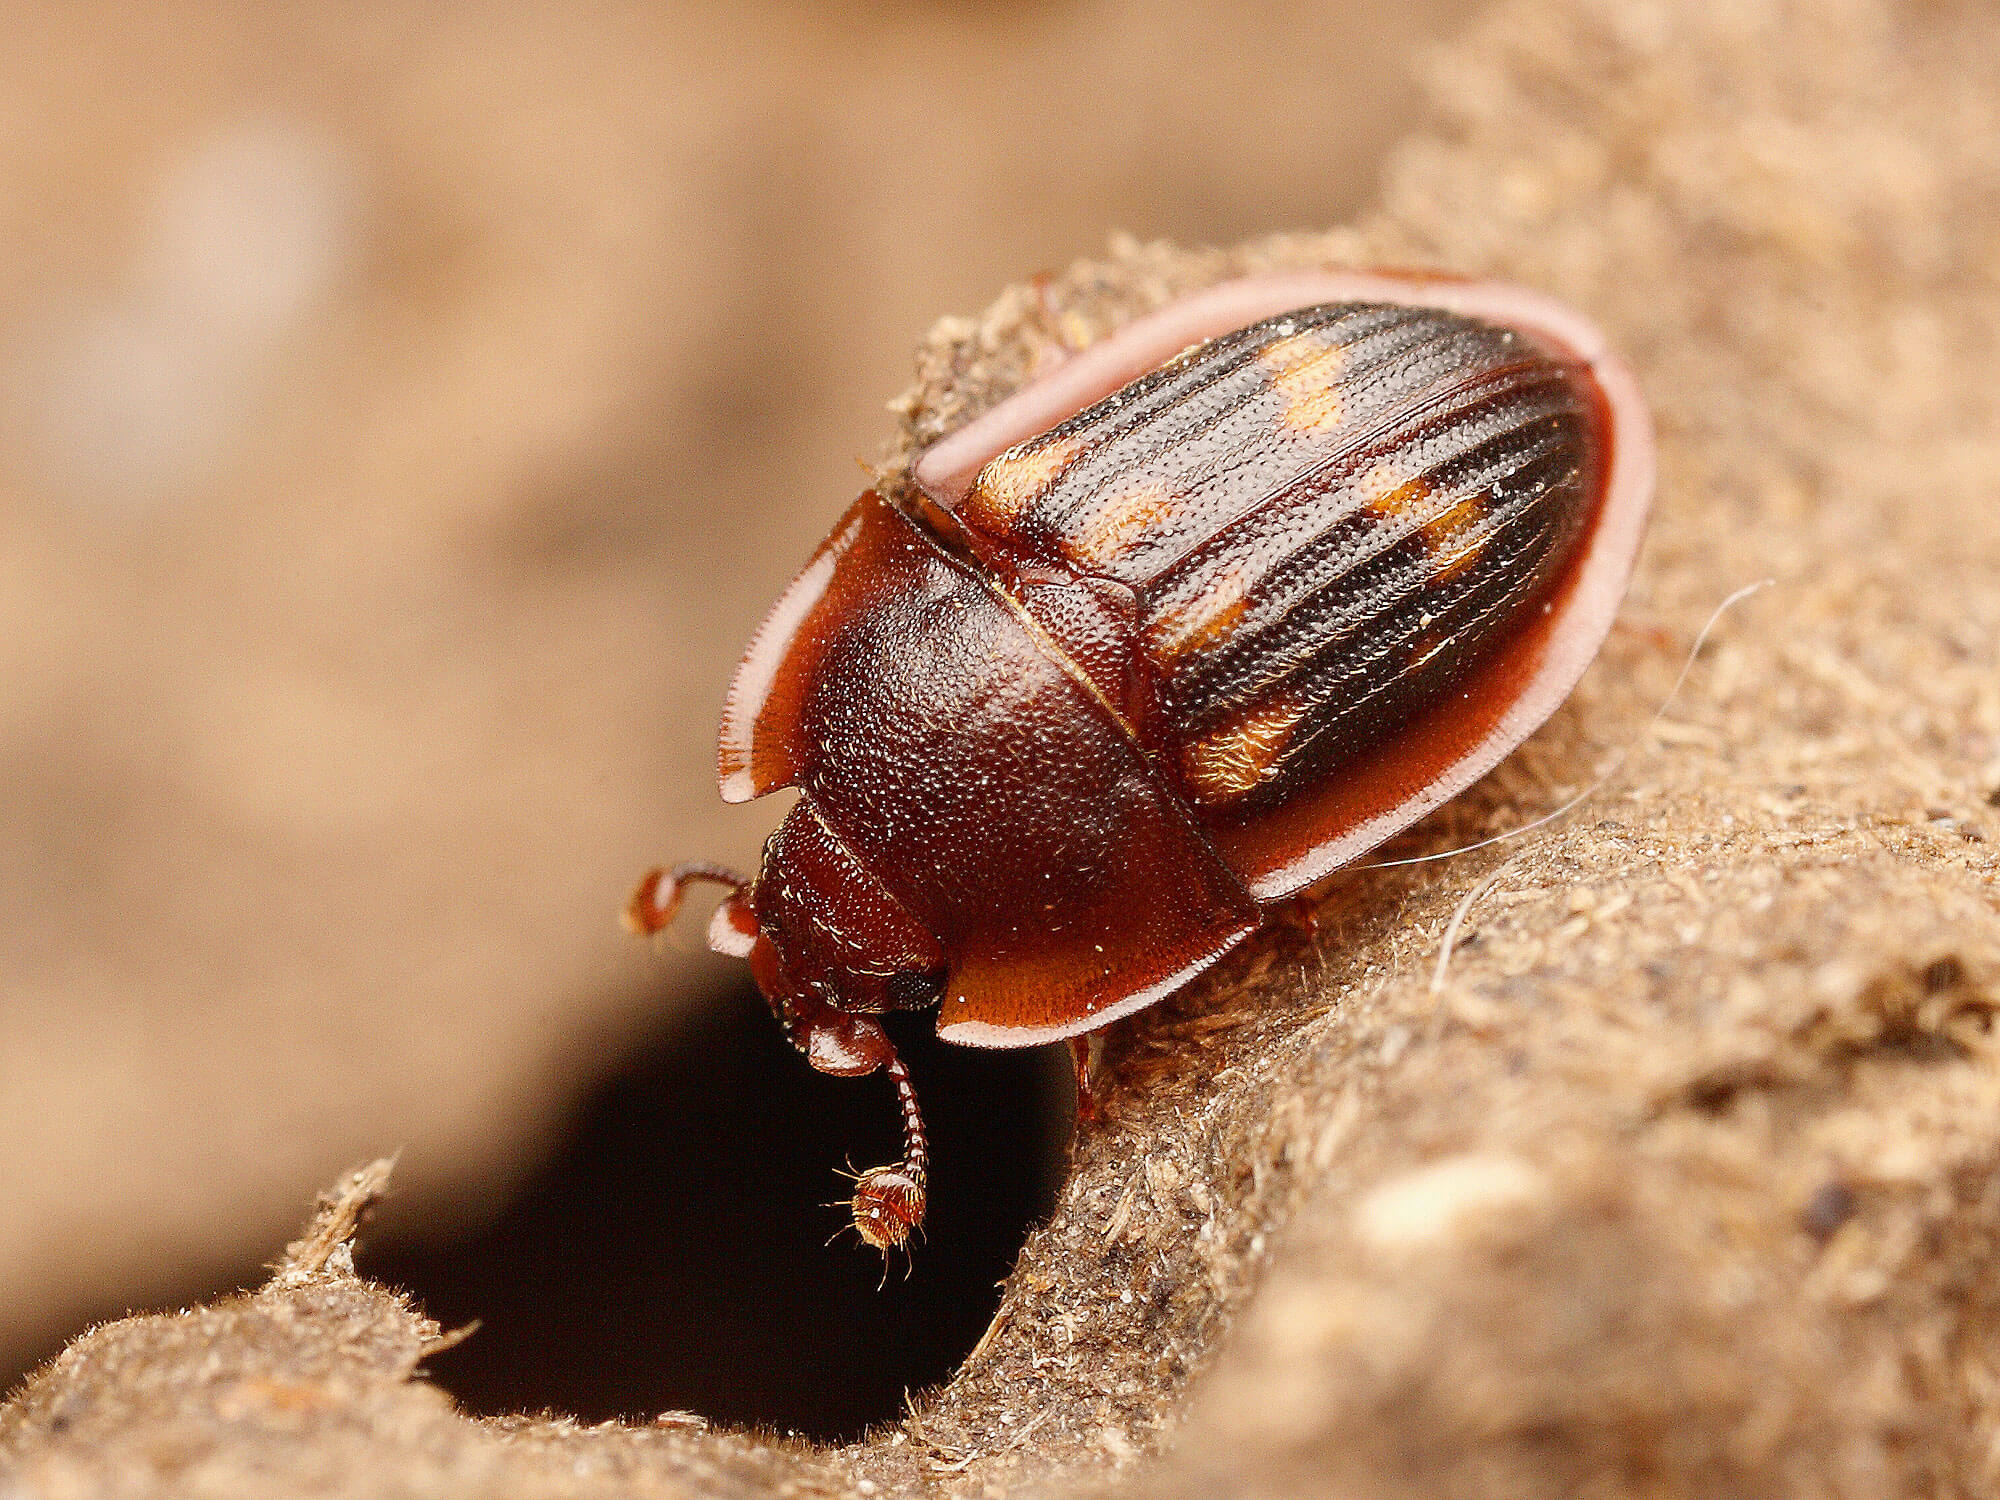 Photo d'Amphotis marginata, un voleur de miellat